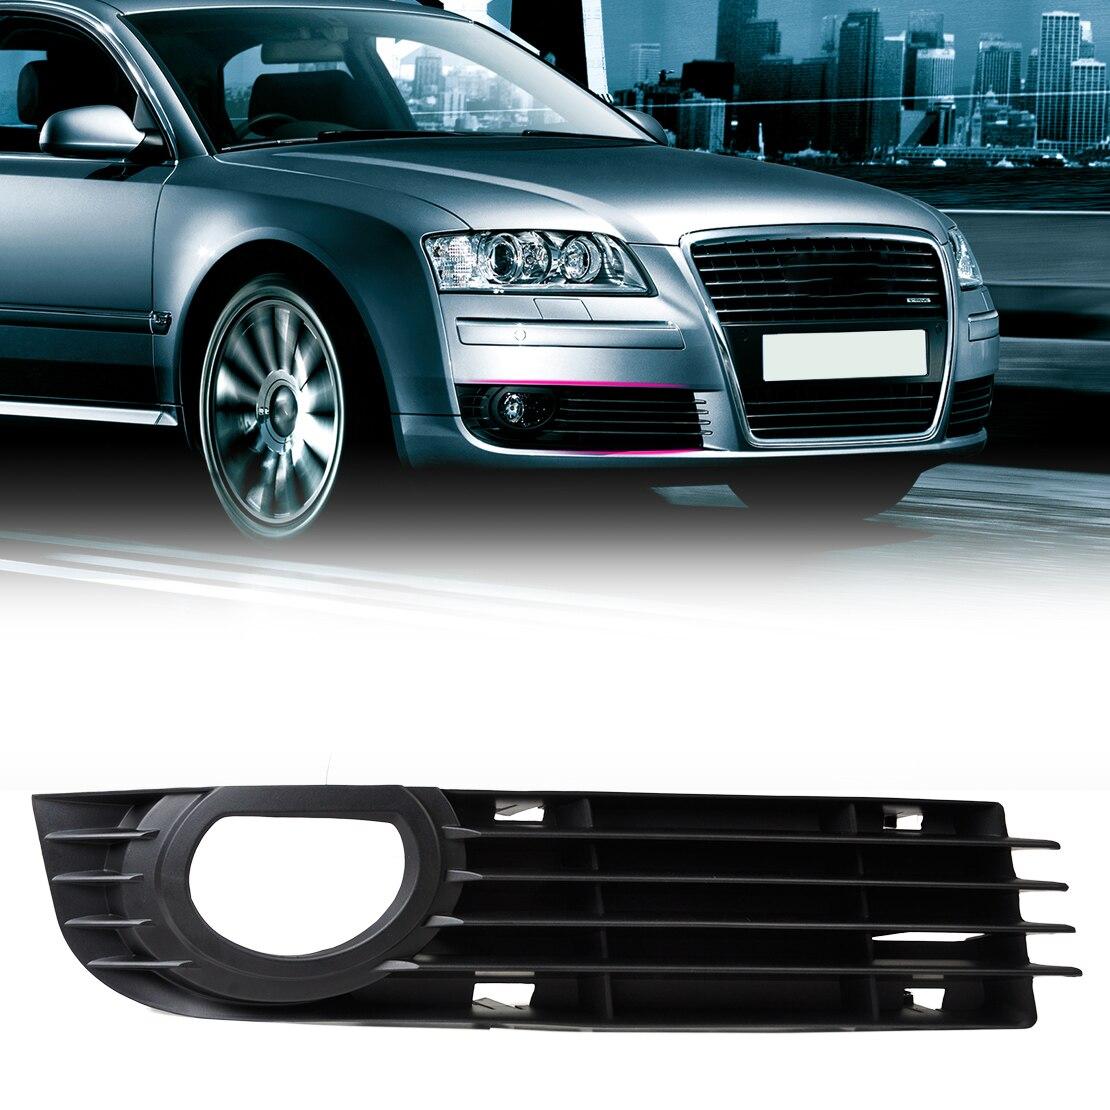 Maxgear Tendeur Spannarm Courroie de distribution Audi VW 2575252